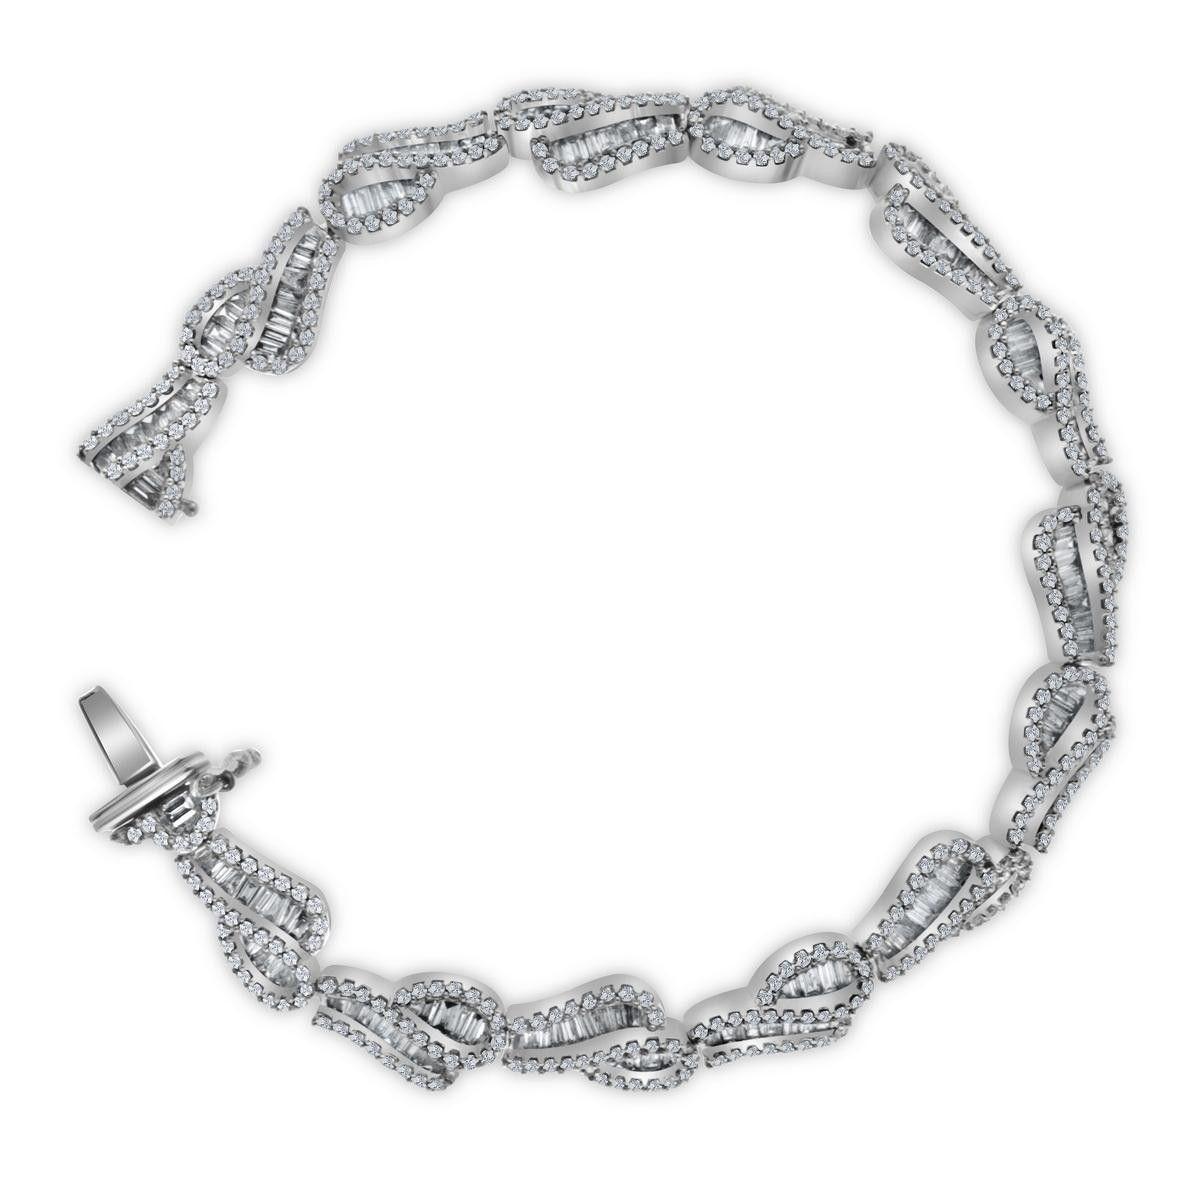 5 1-4CT-Diamond FASHION BRACELET